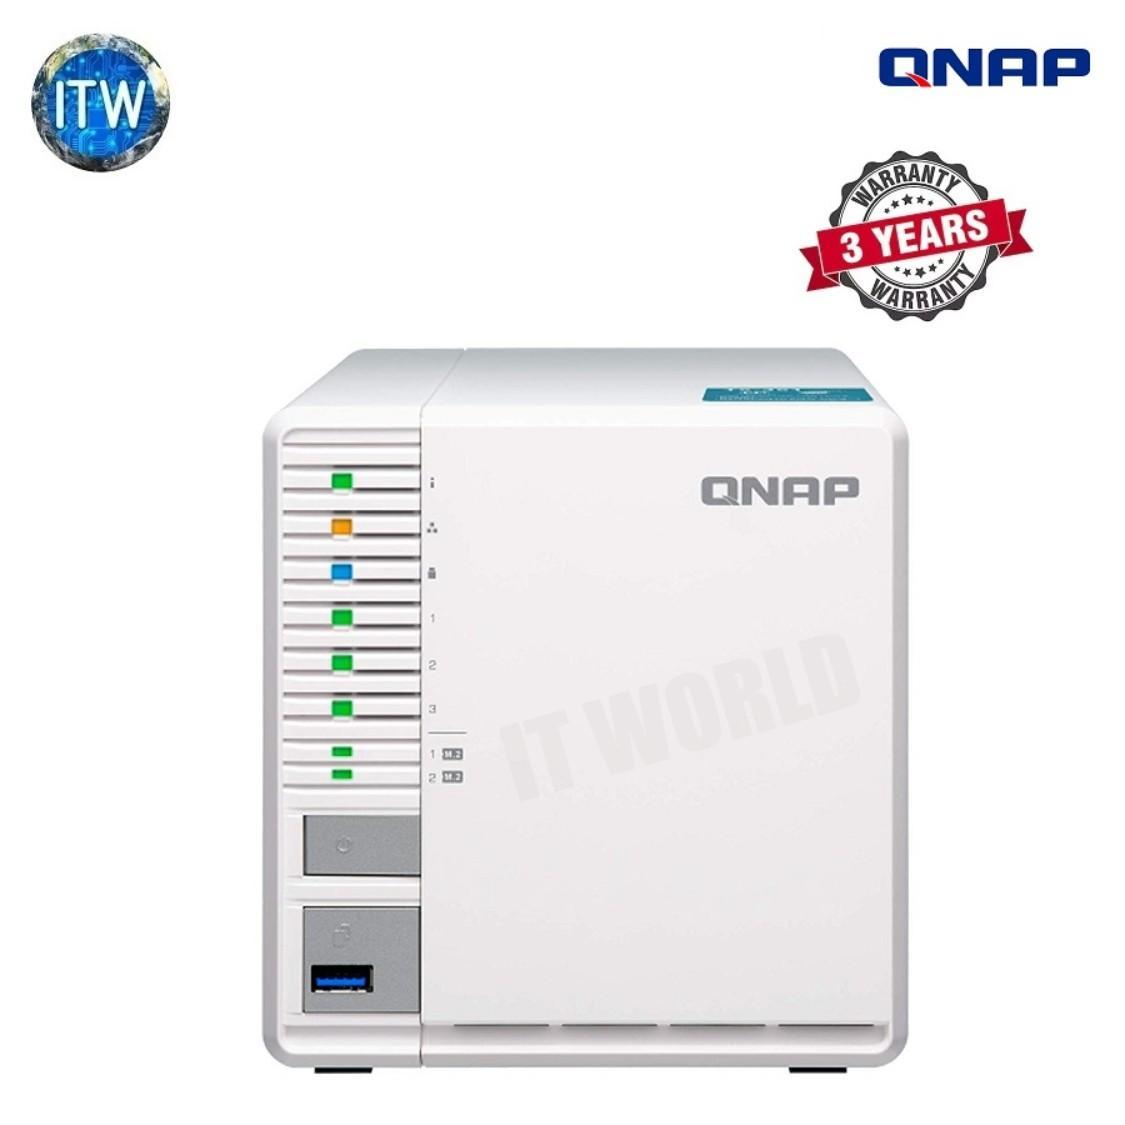 QNAP TS-351 (2GB RAM) 3-Bay Personal Cloud NAS Ideal for RAID5 Storage  Processors